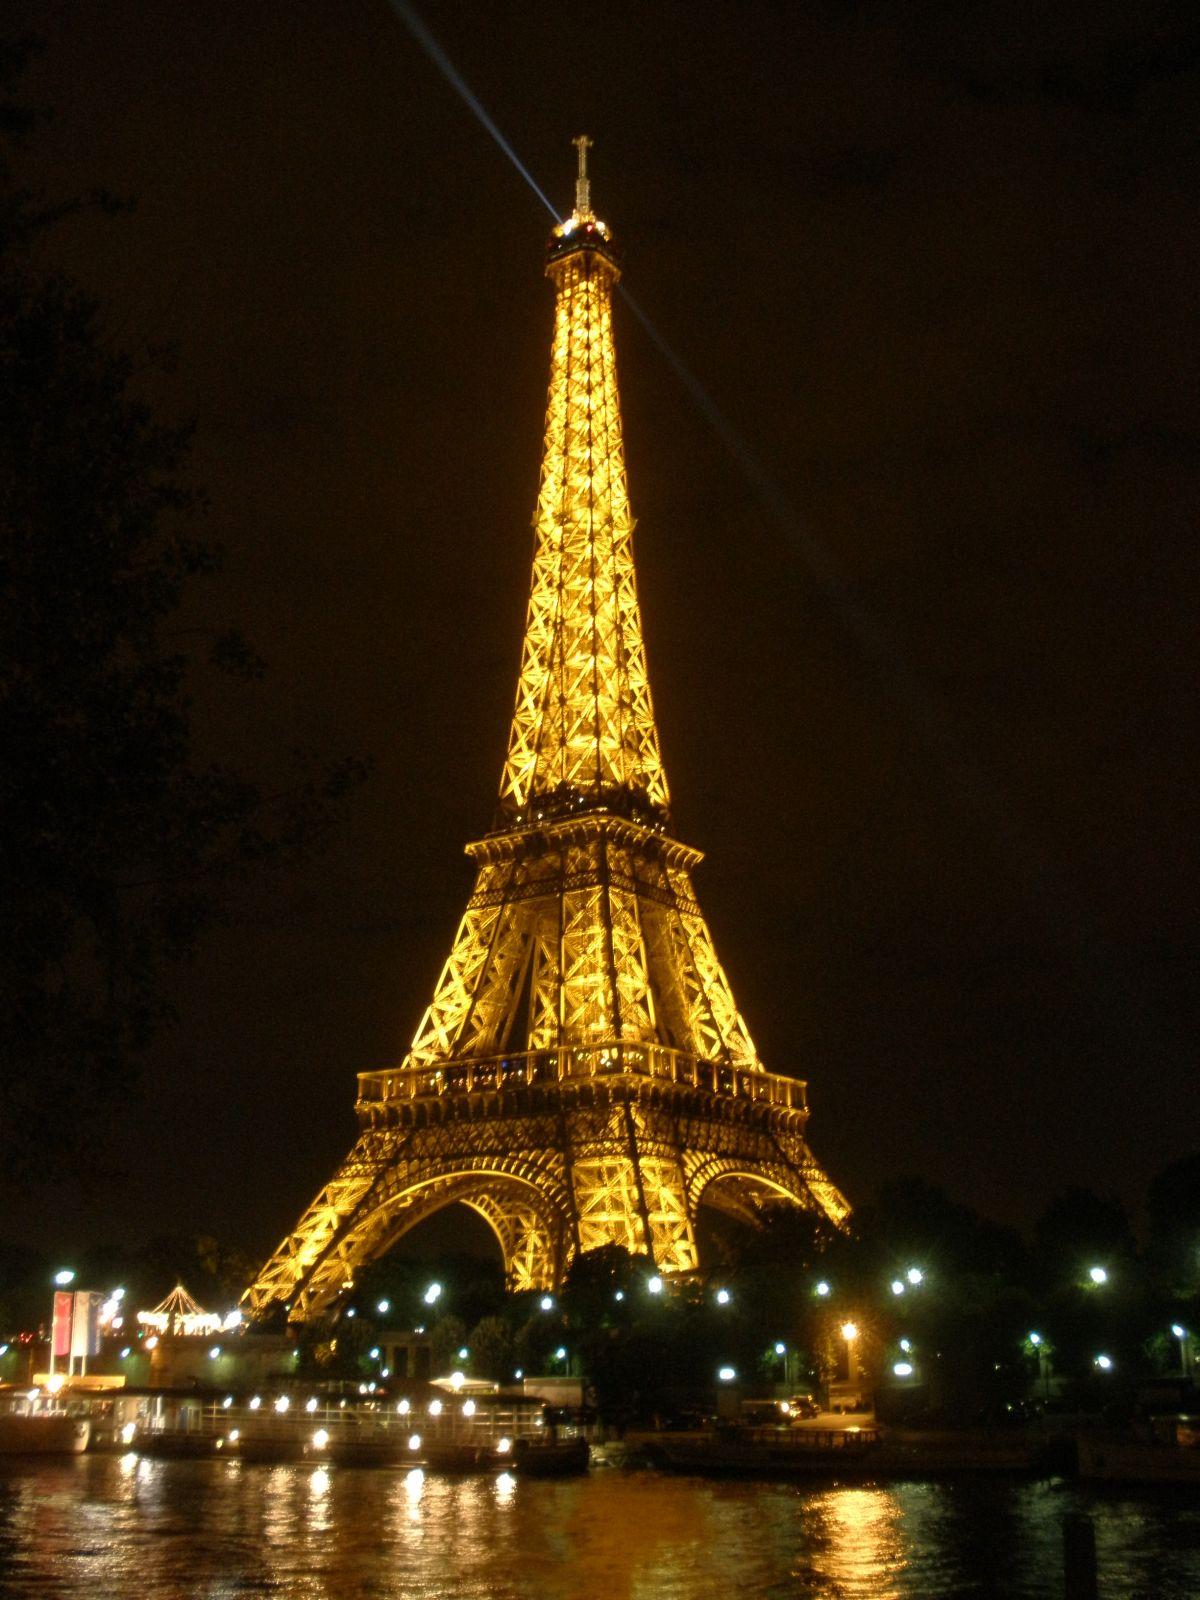 http://2.bp.blogspot.com/-1b-idPczLTo/UI0y0-UedtI/AAAAAAAAAIw/g9cZJo9v0ag/s1600/Menara-Eiffel-dan-Sungai-Seine.jpg